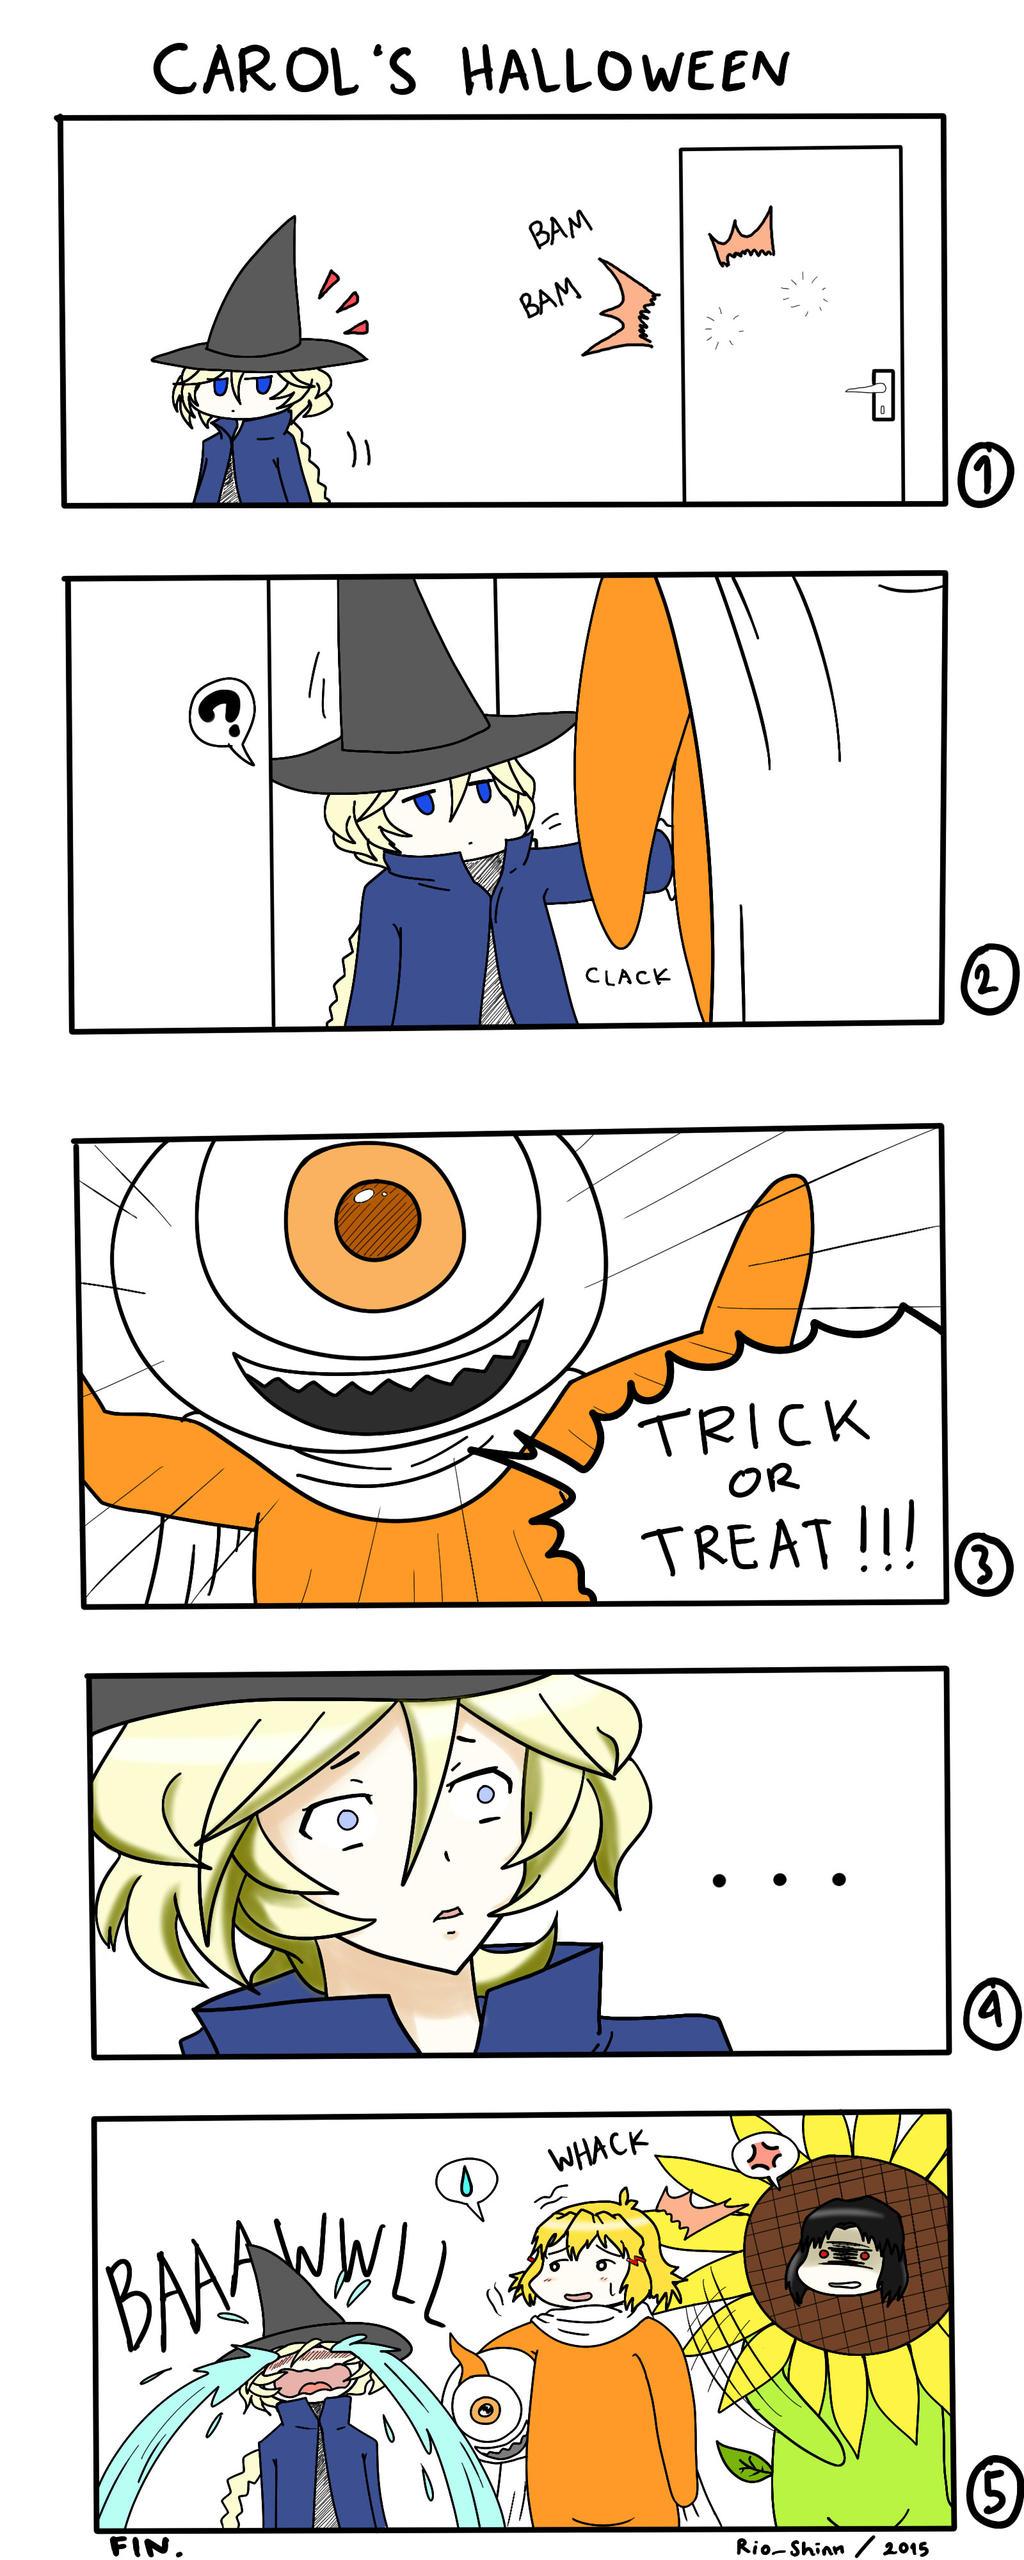 Carol's Halloween by riockman